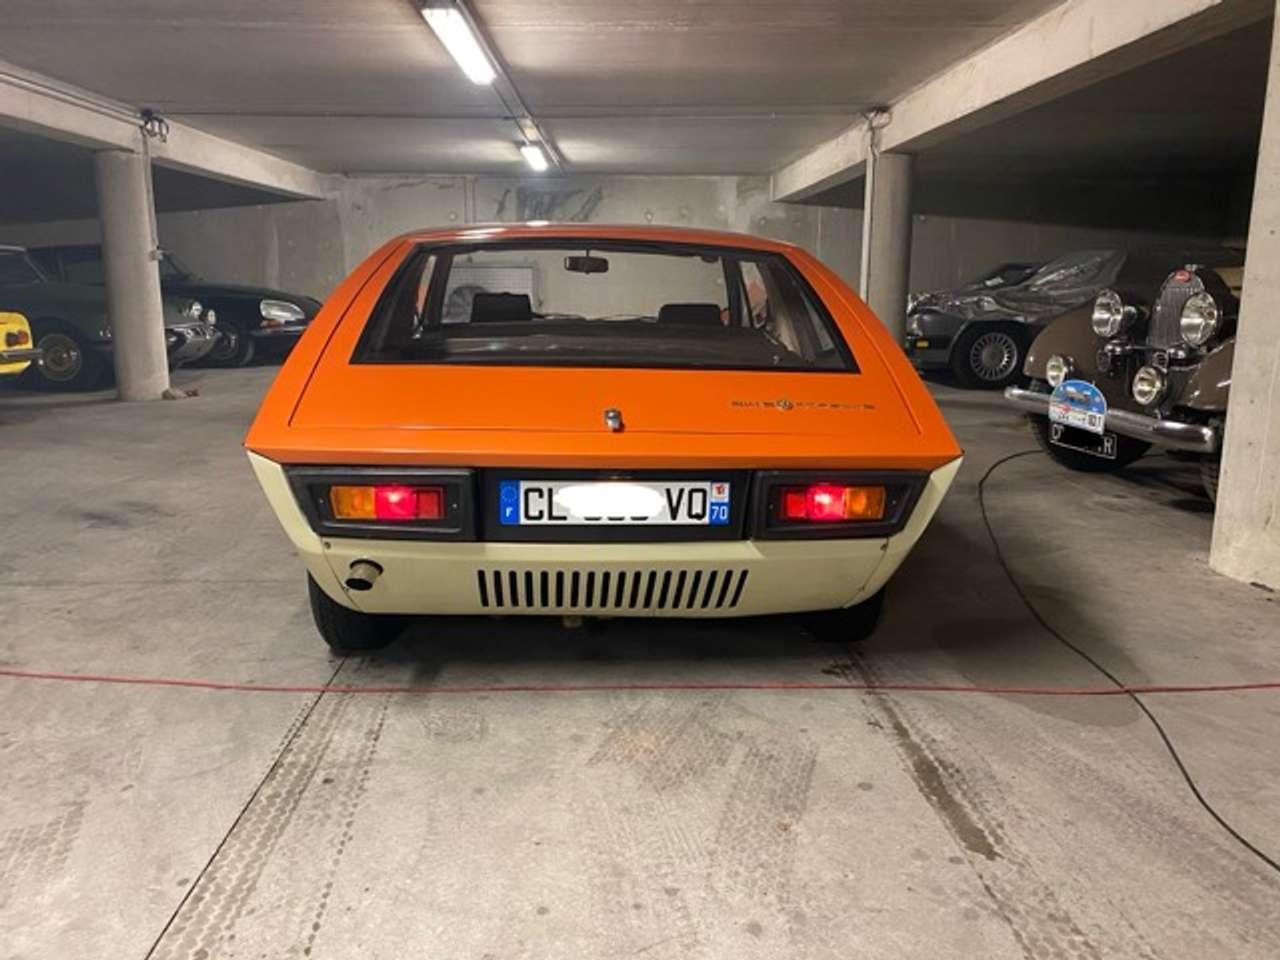 Arrière Porsche 914/6 Murène